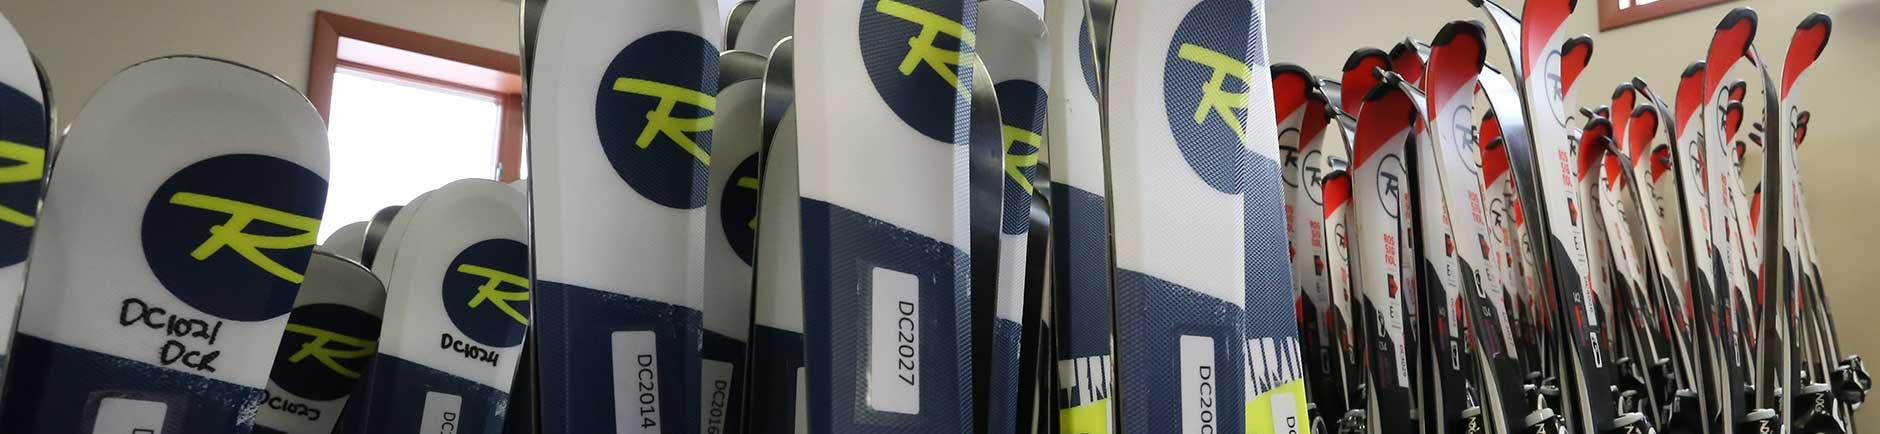 Rossignol ski rentals at Deep Creek Ski & Board